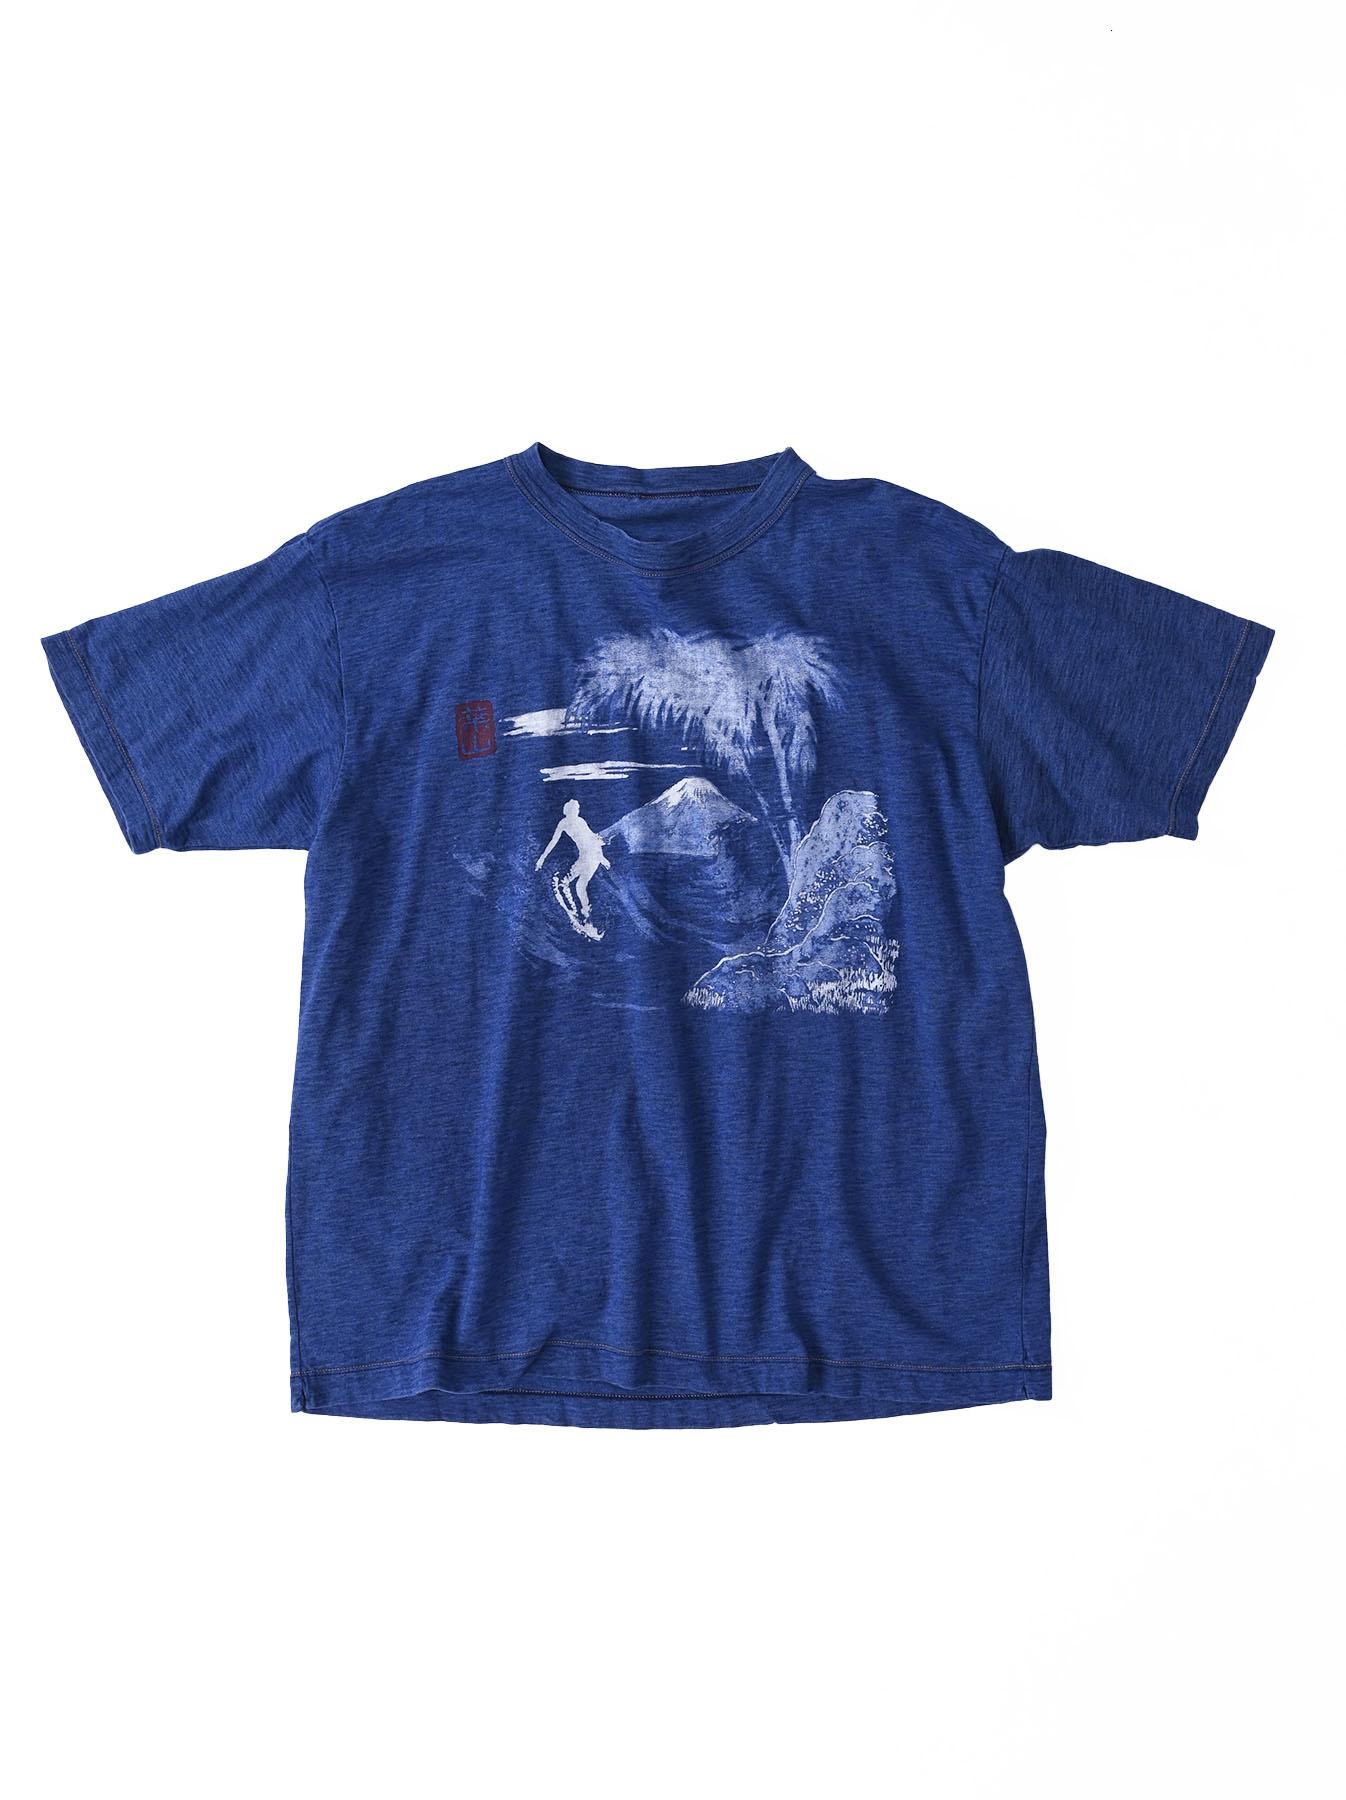 Distressed Indigo Ukiyo de Surf 908 Ocean T-shirt (0621)-1